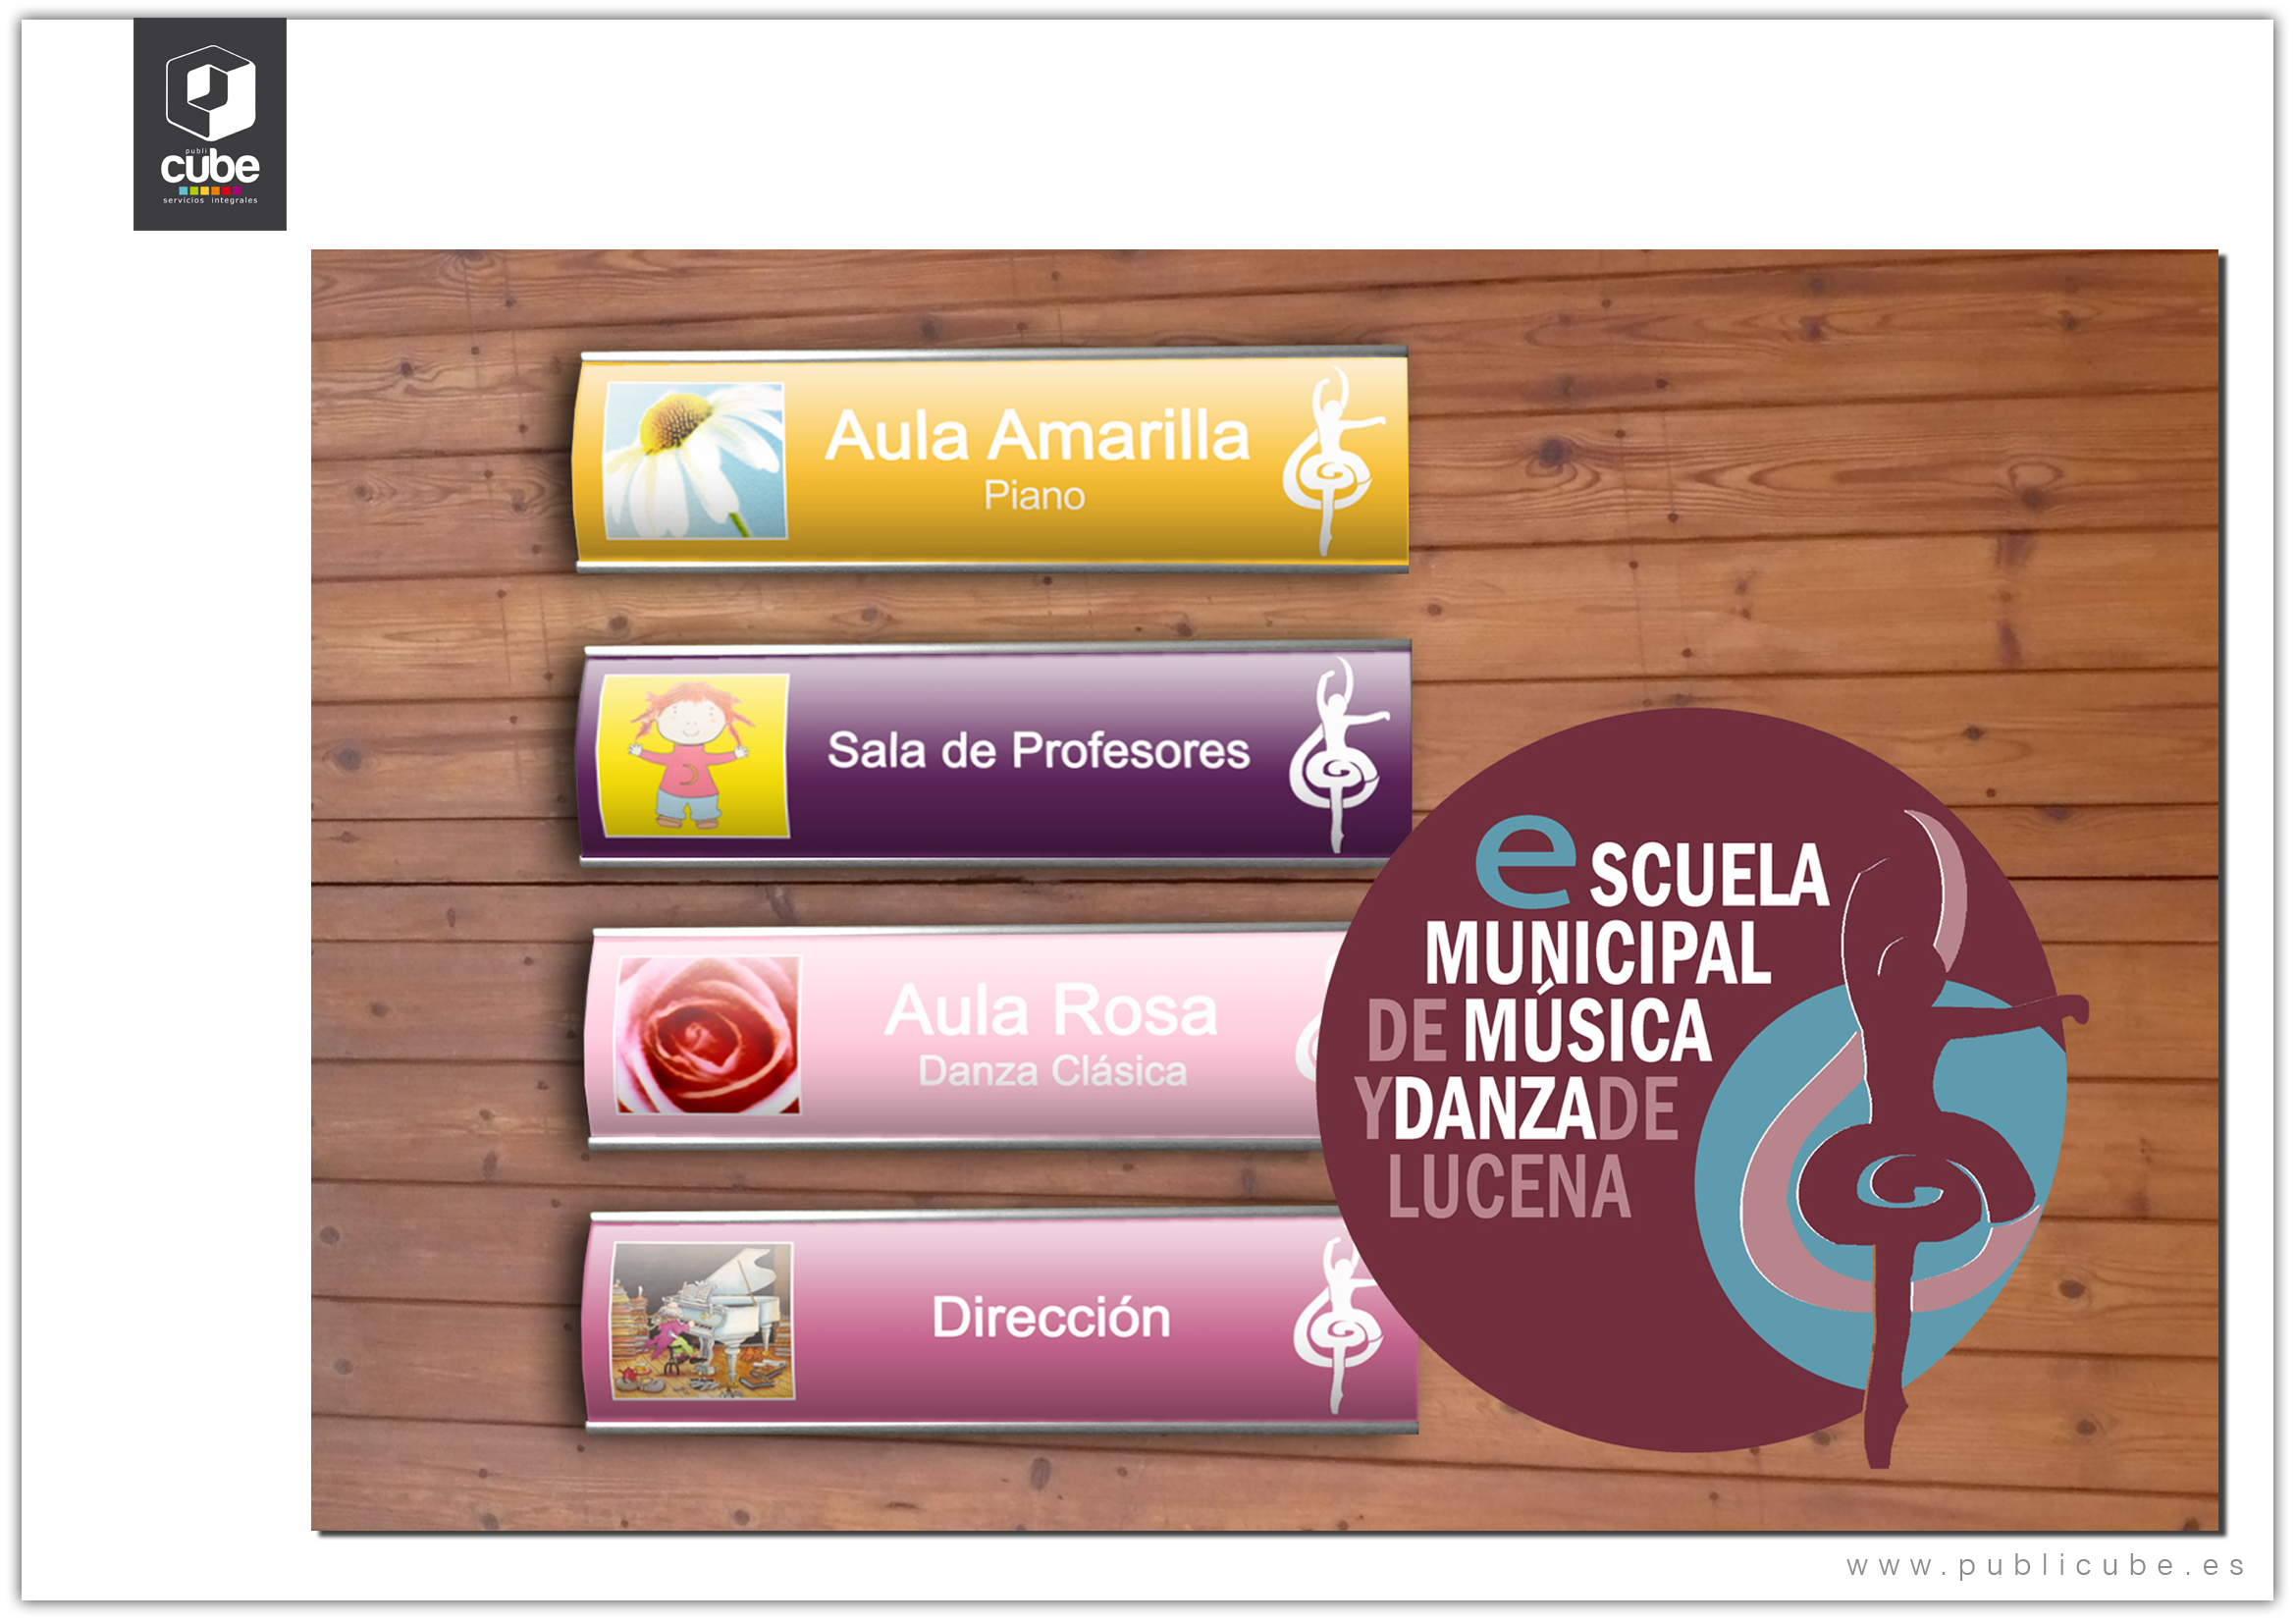 e_musica_y_danza_lucena_señaletica